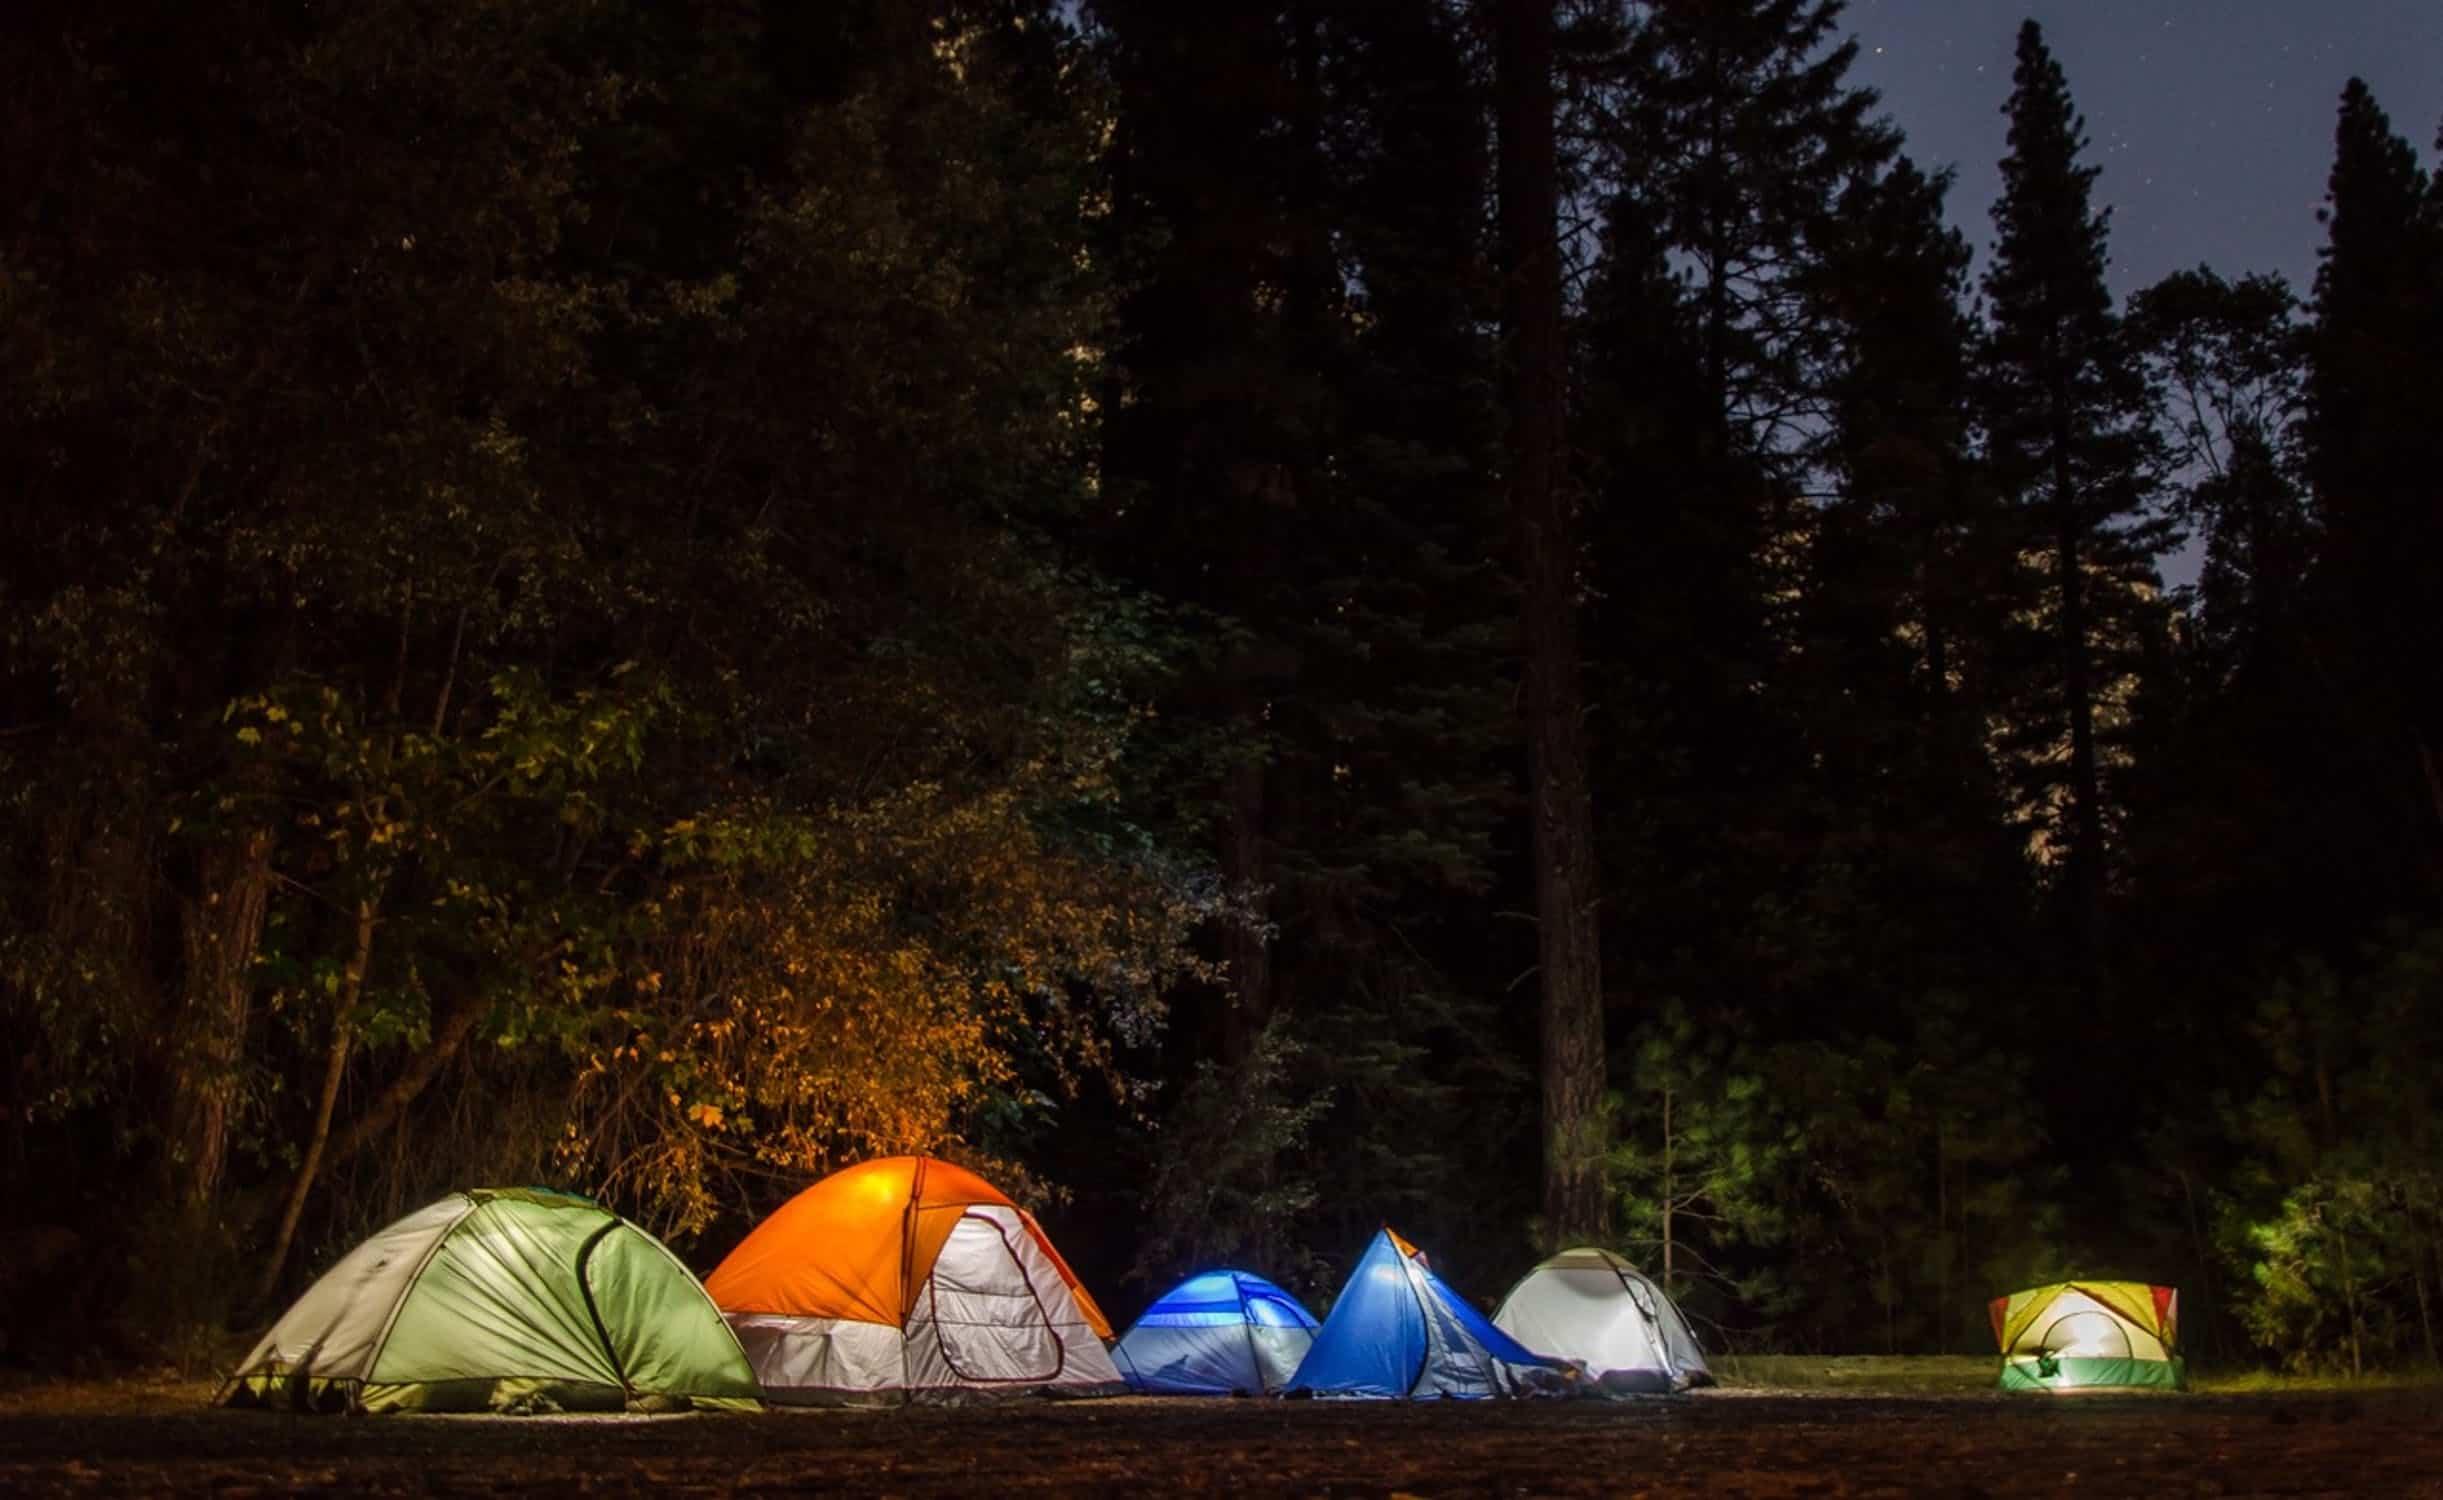 geneva on the lake tent camping